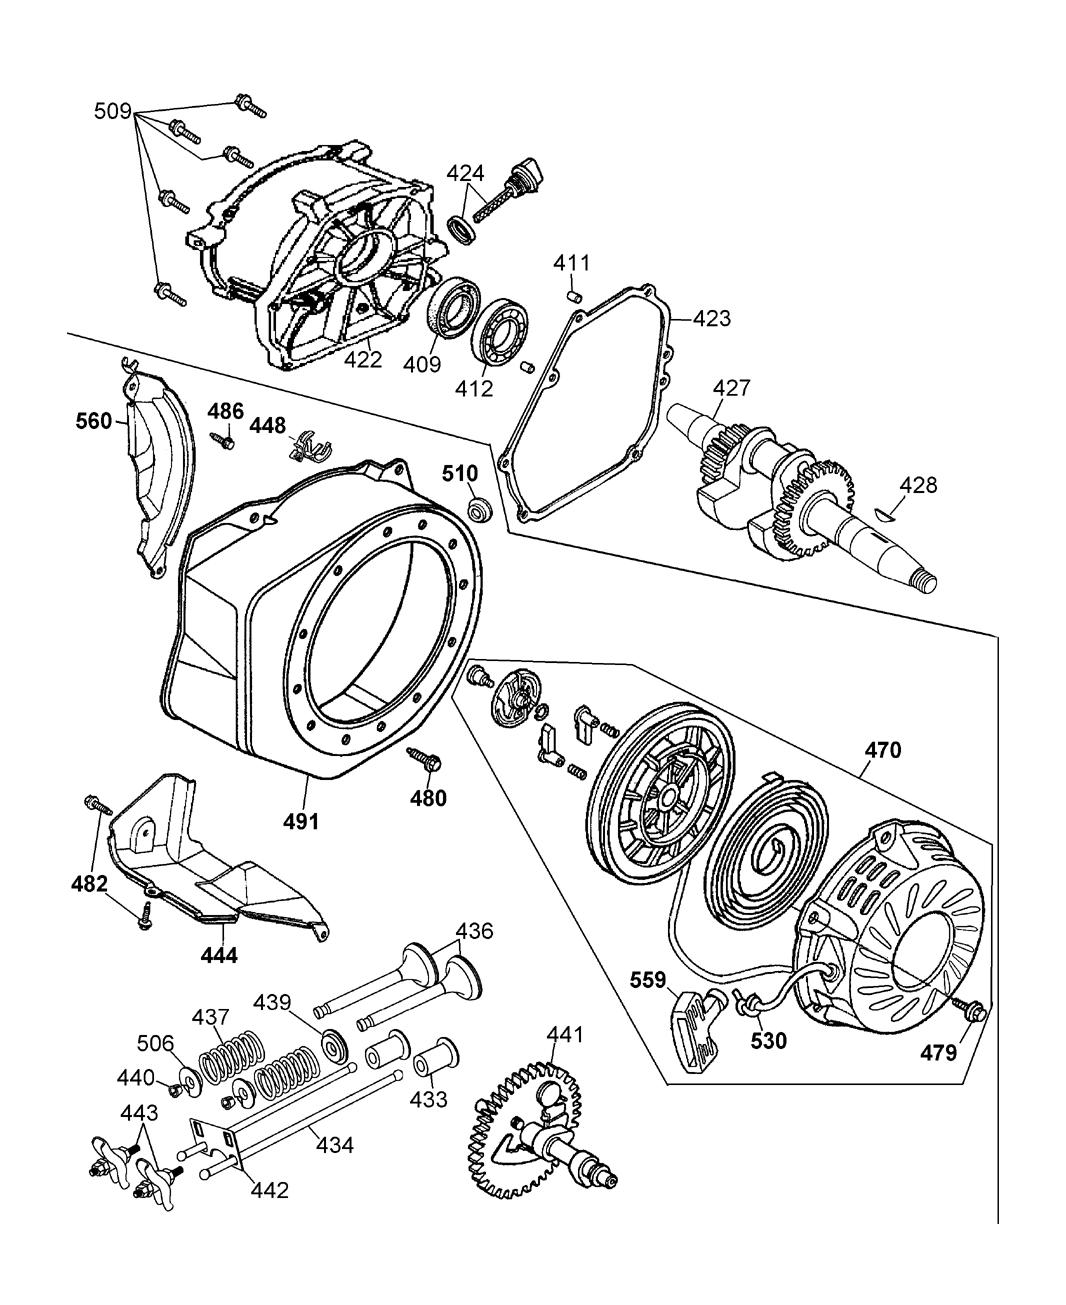 PCI2200-B2-Porter-Cable-T1-PB-1Break Down